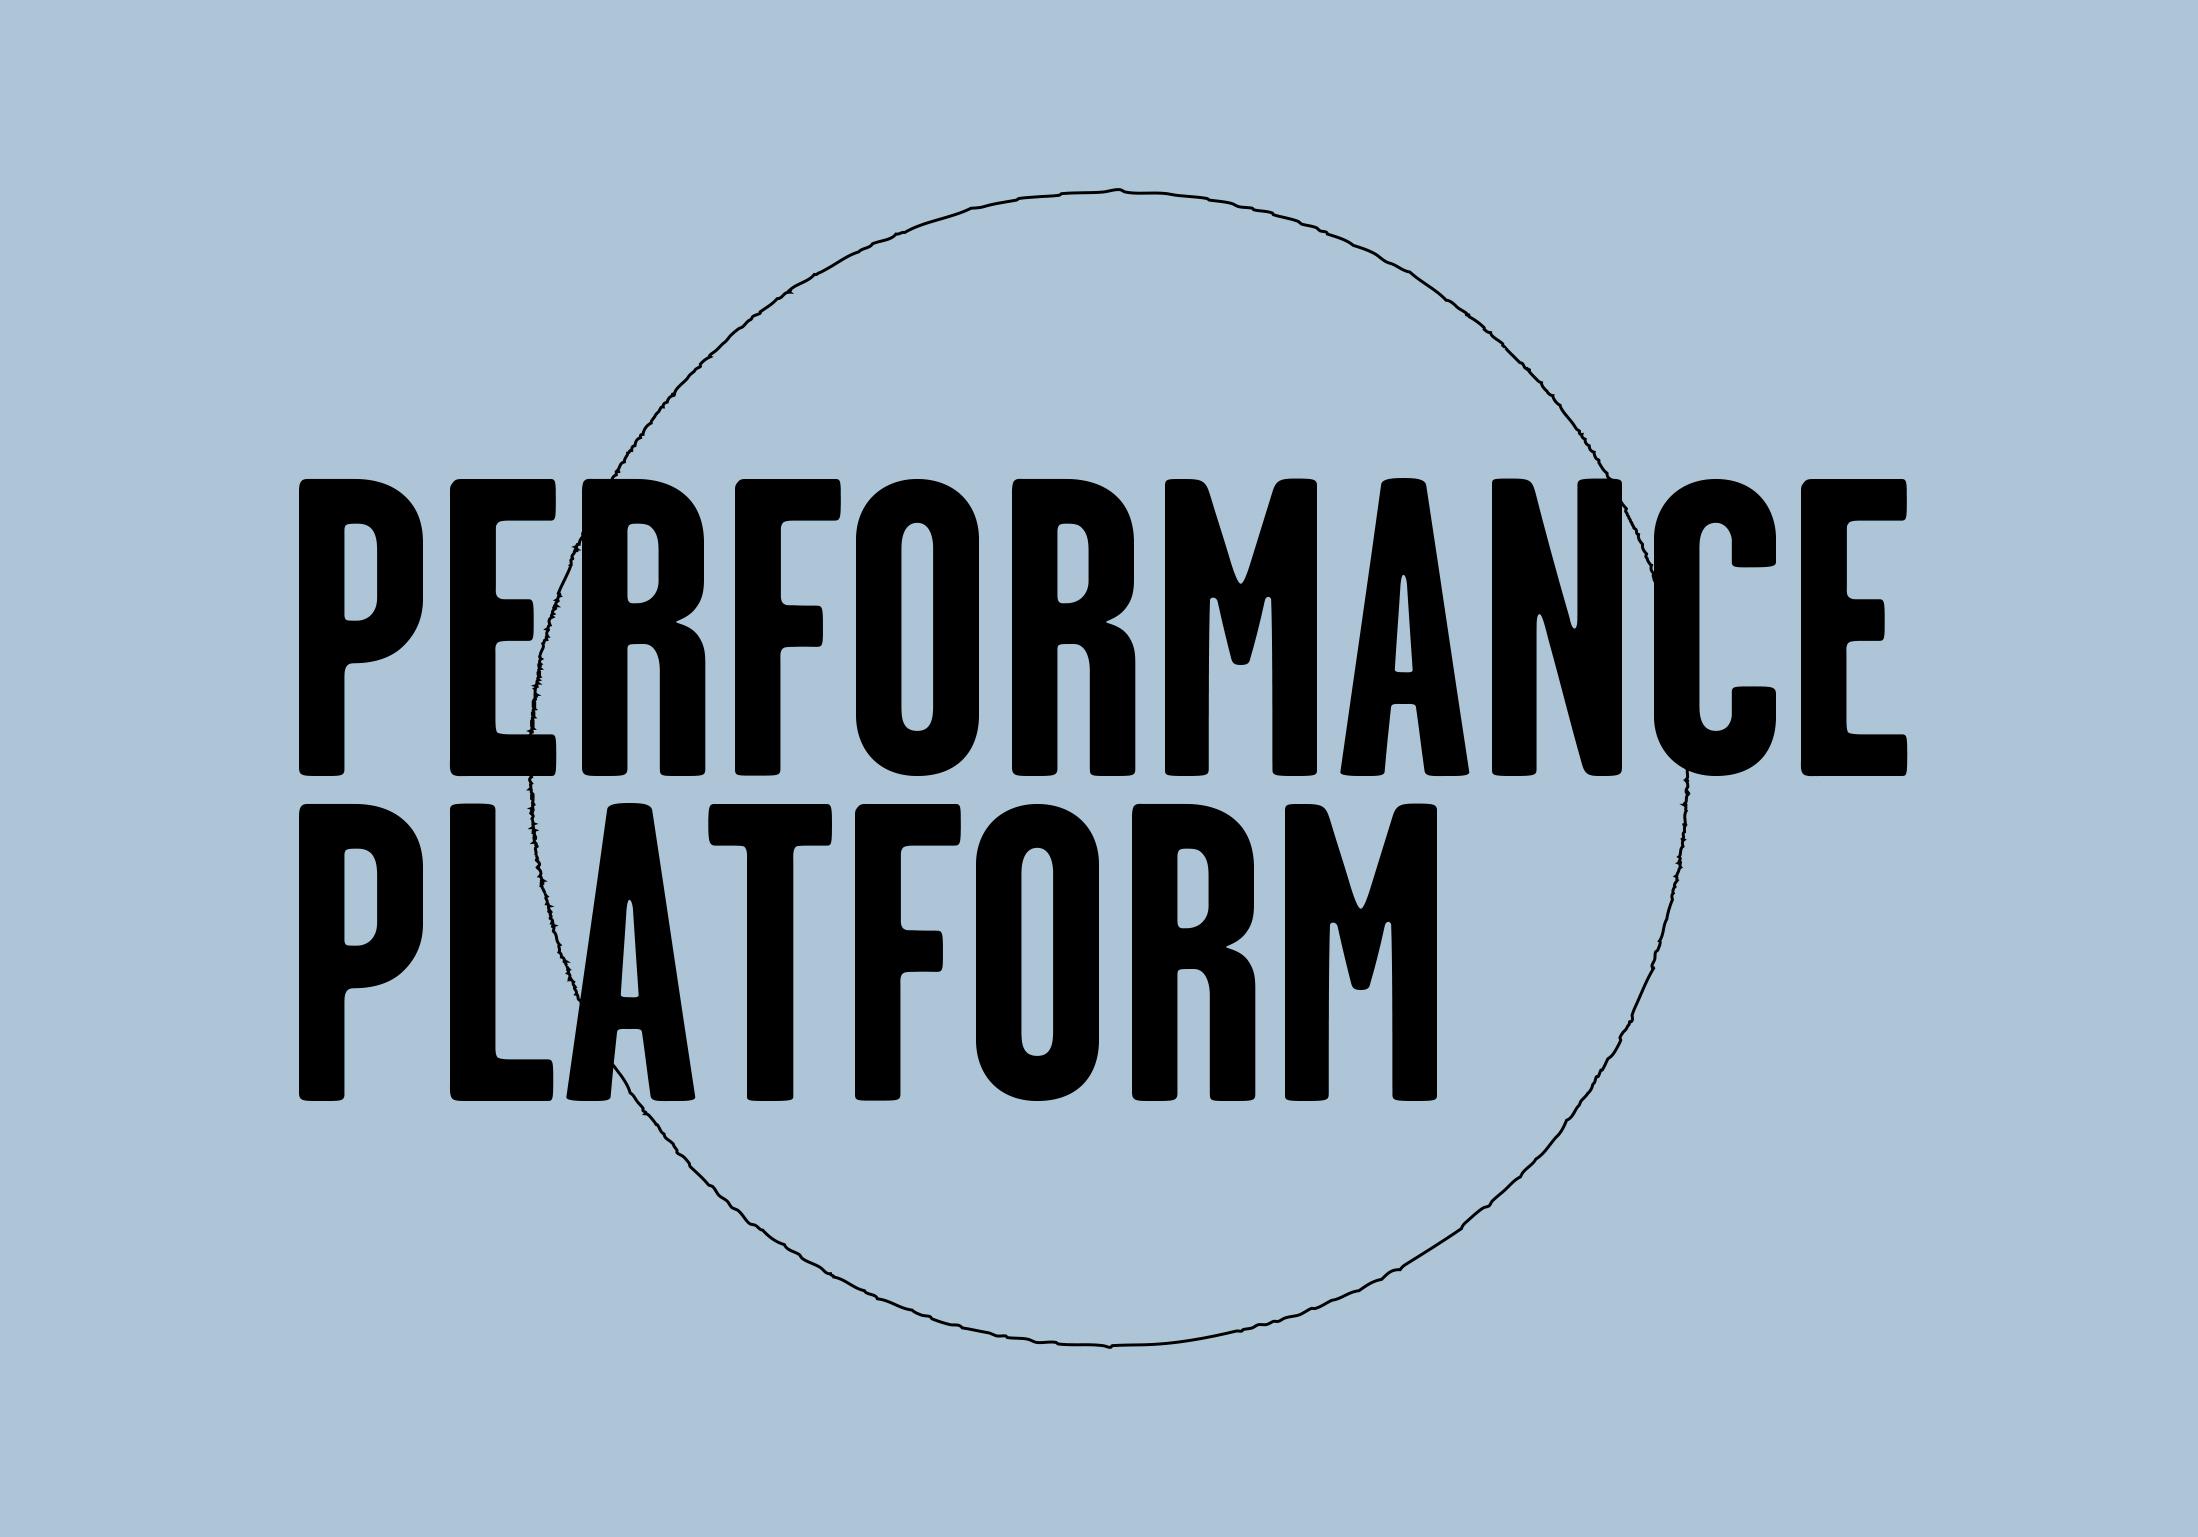 Performance Platform / Banner / 2014